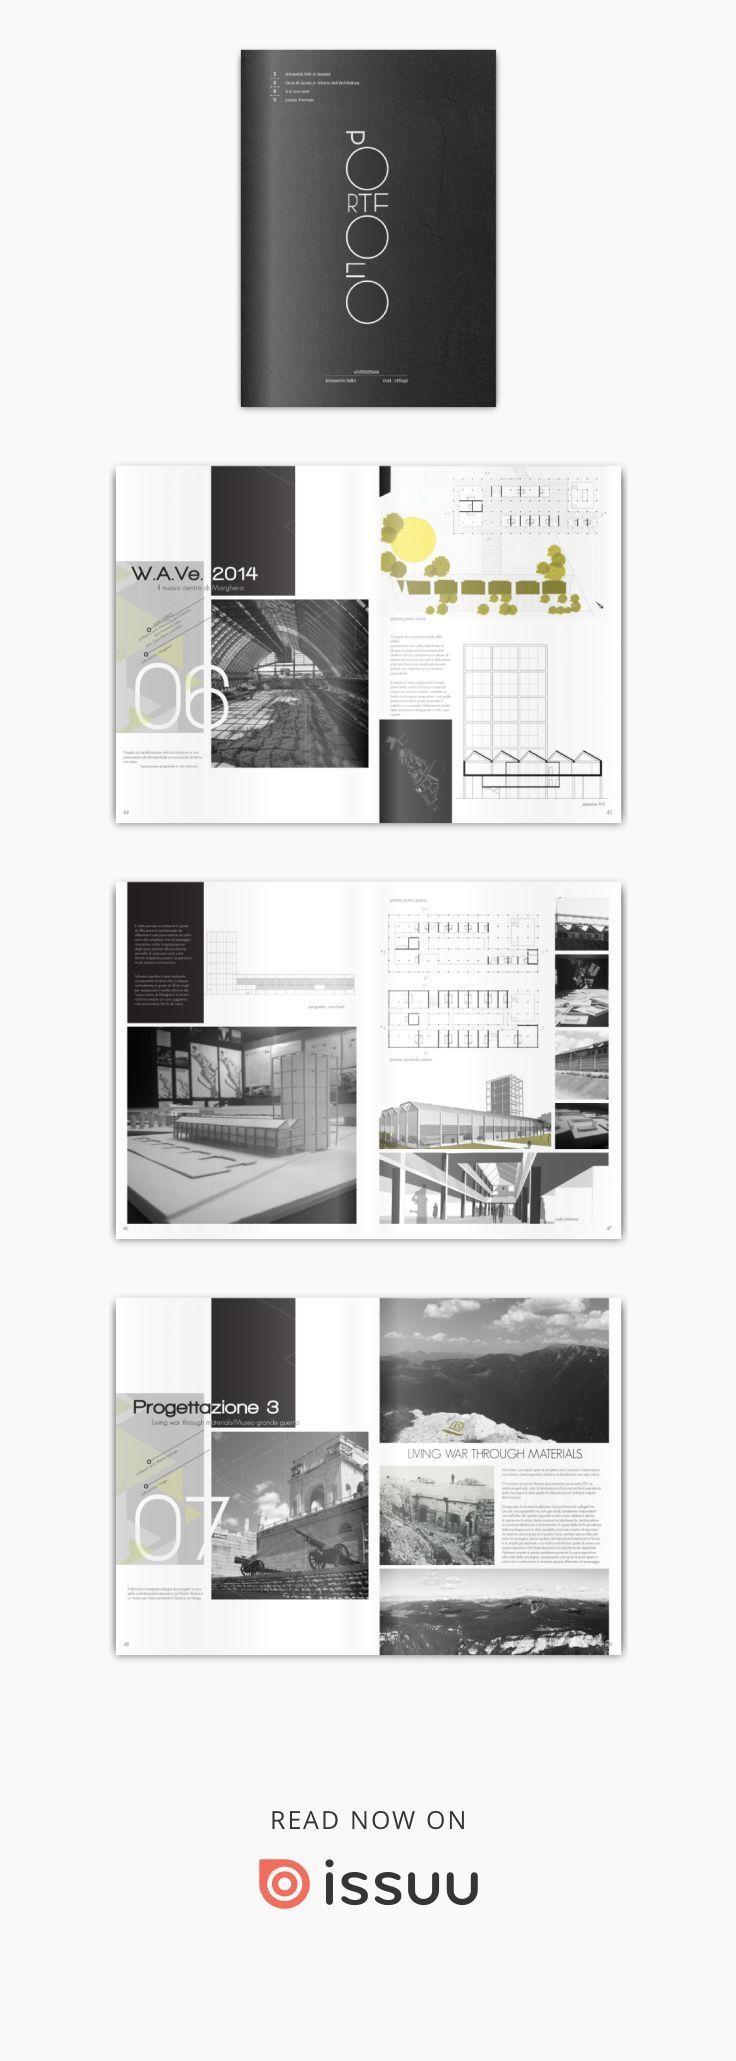 portfolio d u0026 39 architettura iuav